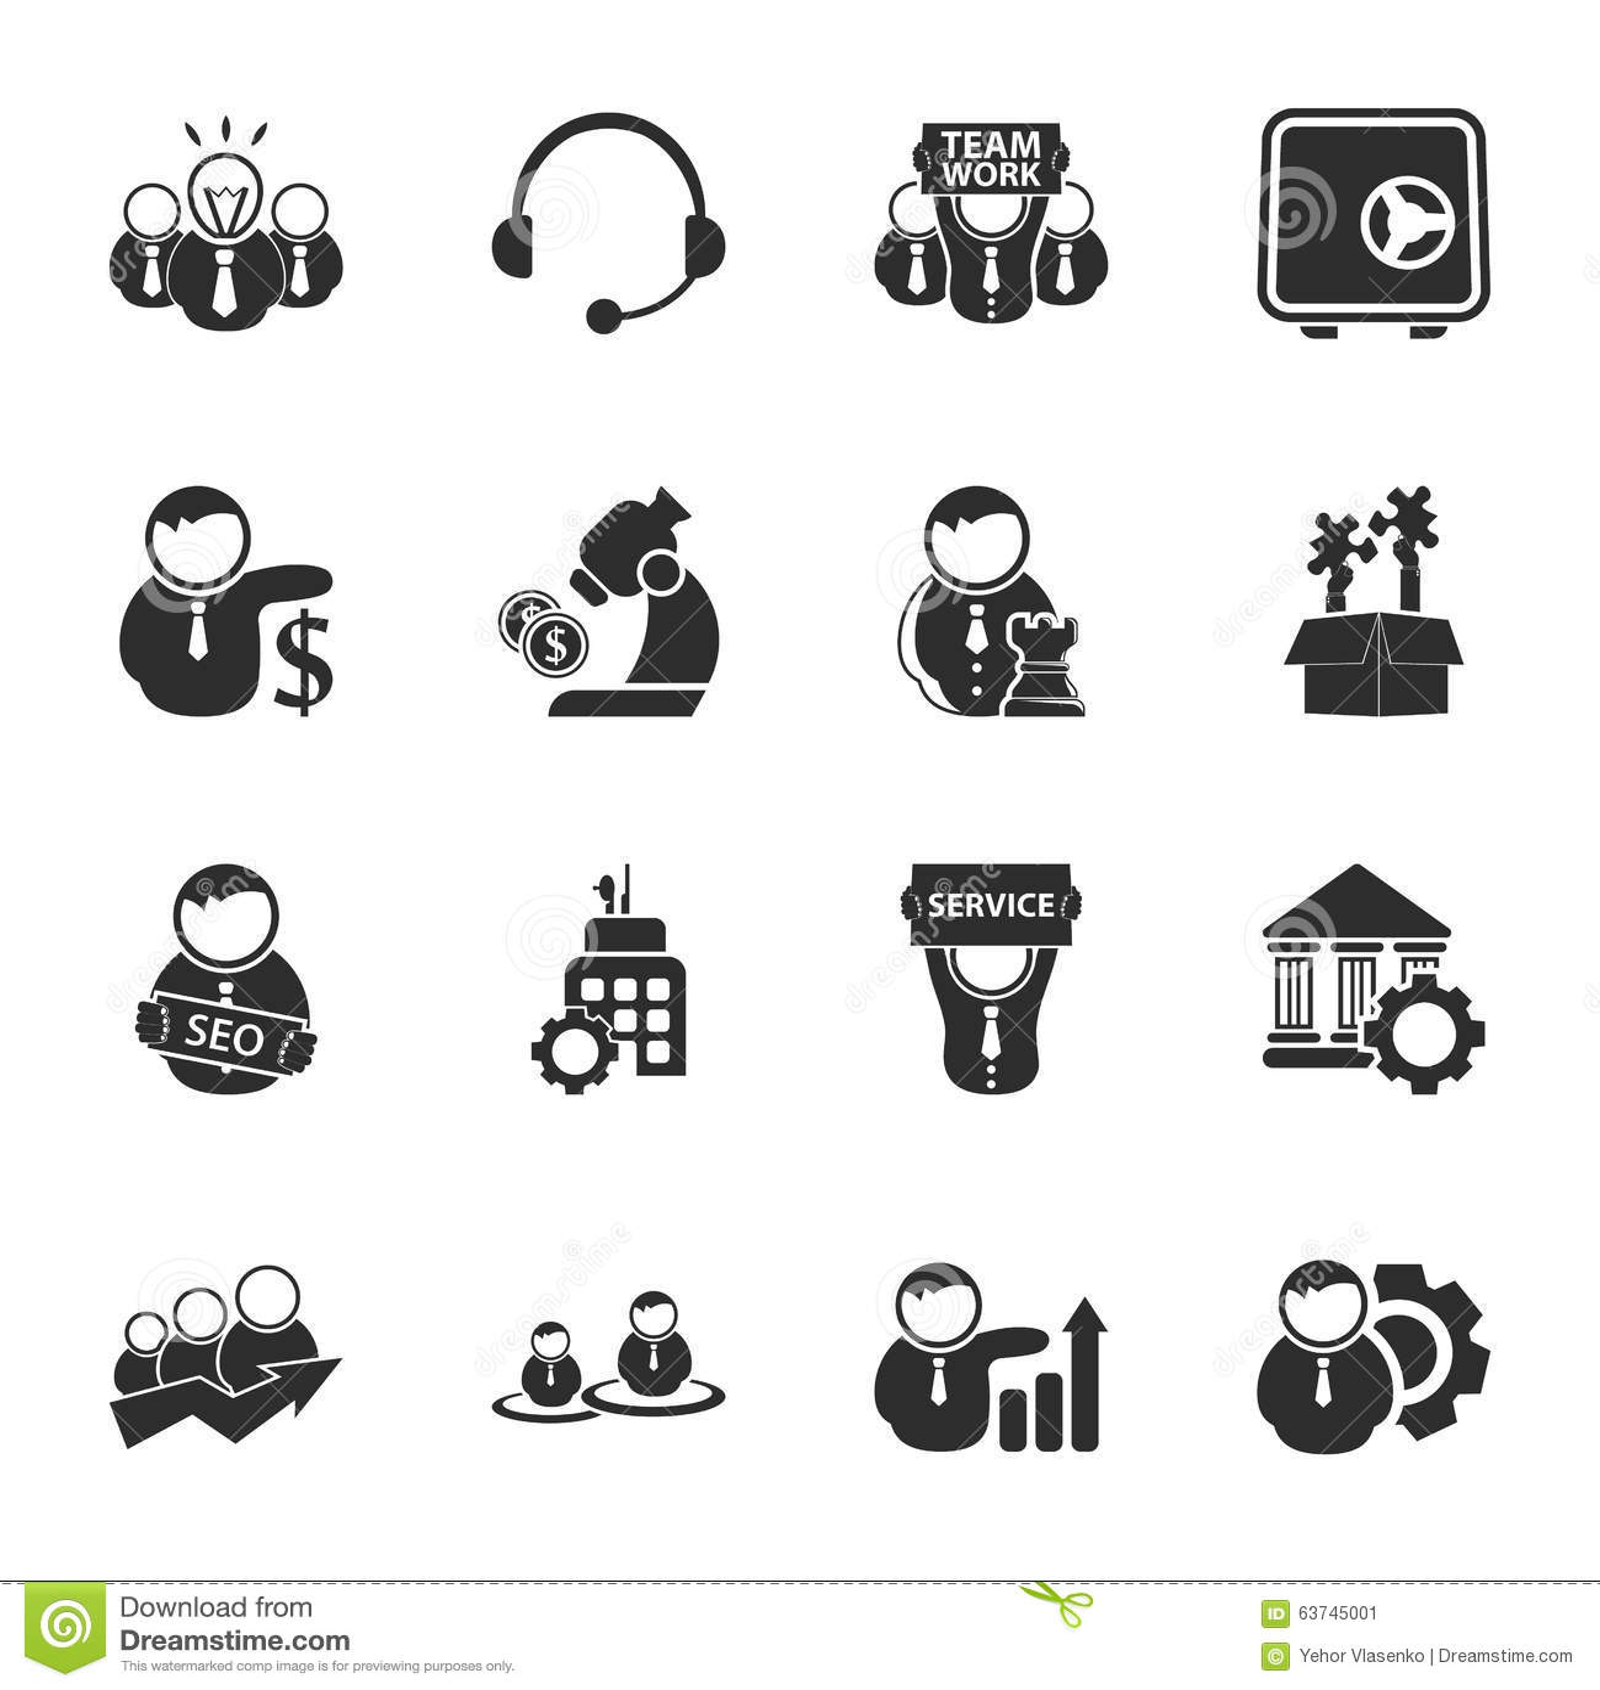 besides Royalty Free Stock Image  puter Equipment Icons Set Image33471426 besides Ausmalbilder  puter Malvorlagen likewise MACQ3BsL2es Desktop  puter Doodle together with Desenhos De Inform c3 a1tica Para Colorir. on laptop monitor